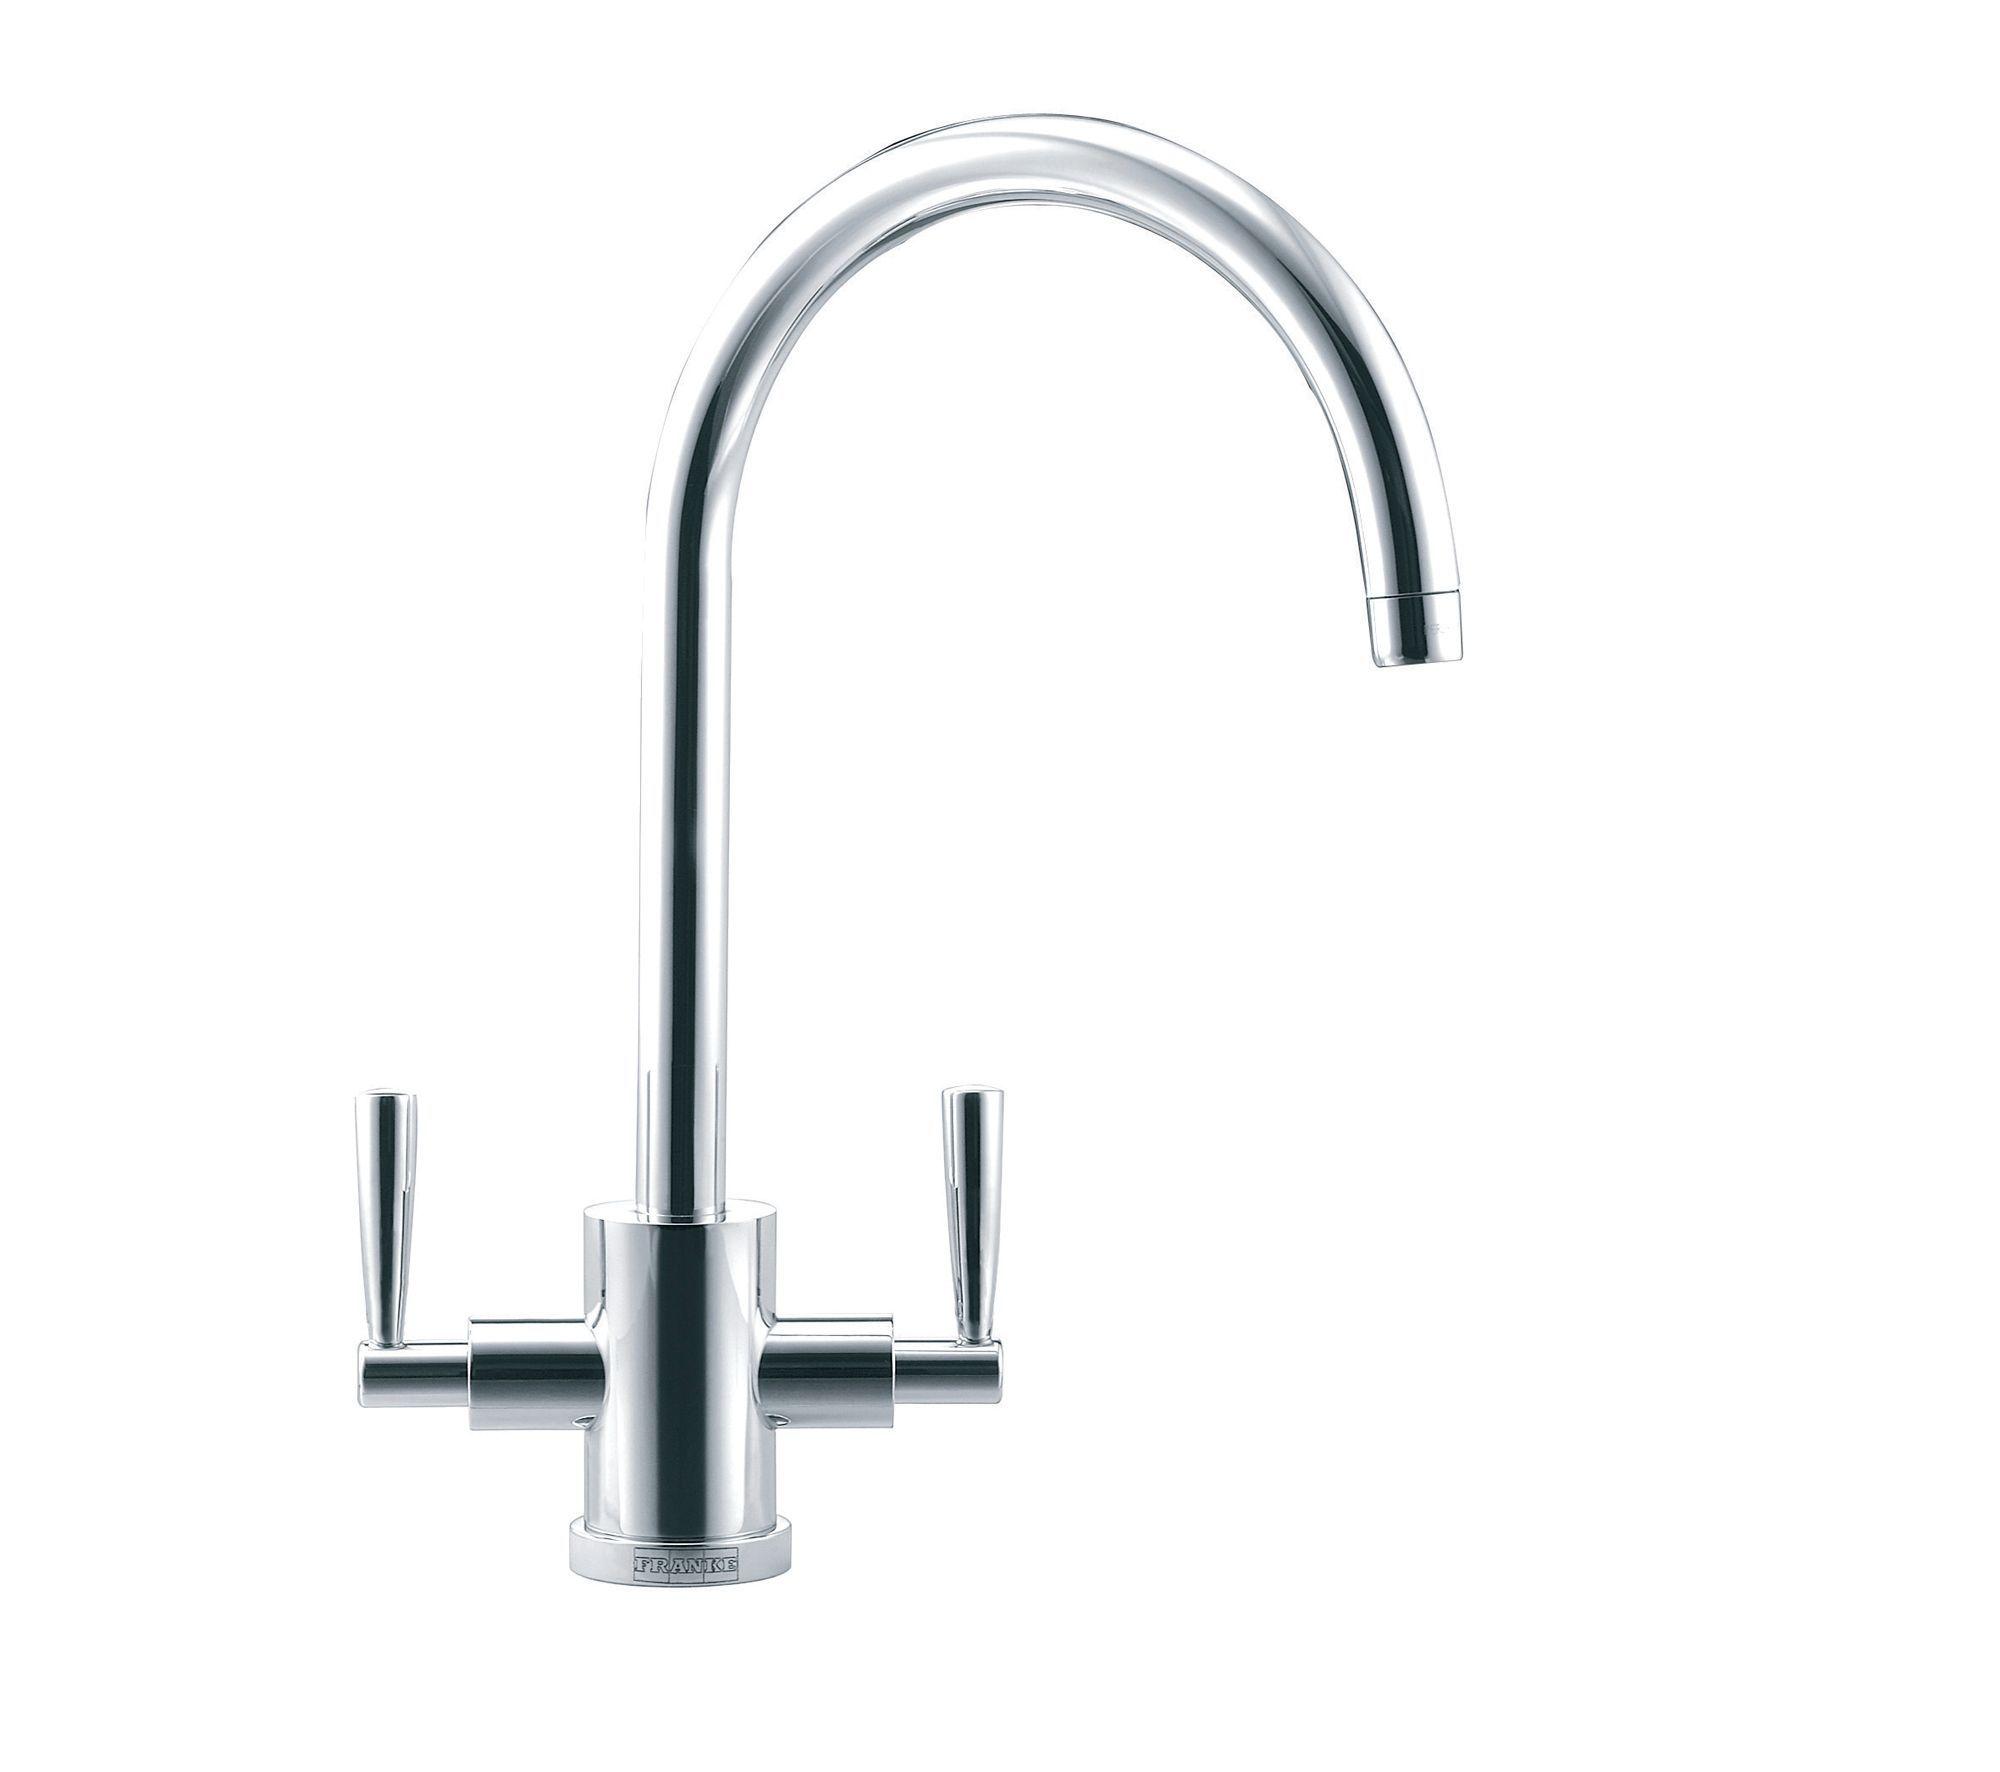 Franke olympus chrome finish kitchen sink mixer tap sink mixer franke olympus chrome finish kitchen sink mixer tap bq for all your home and garden workwithnaturefo